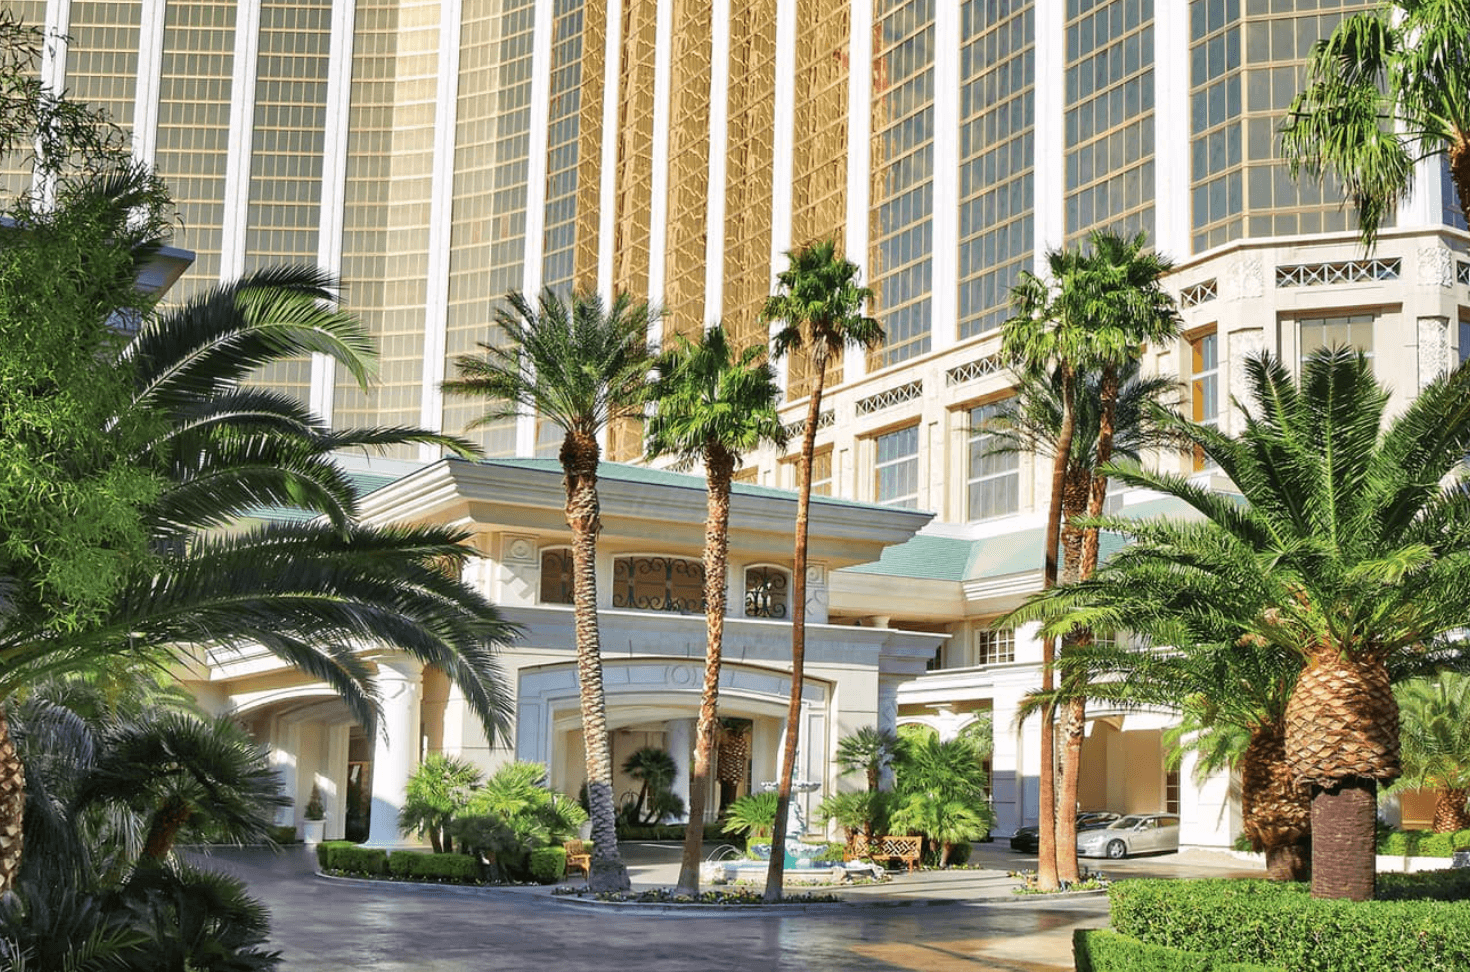 Las Vegas Four Seasons Hotel.png